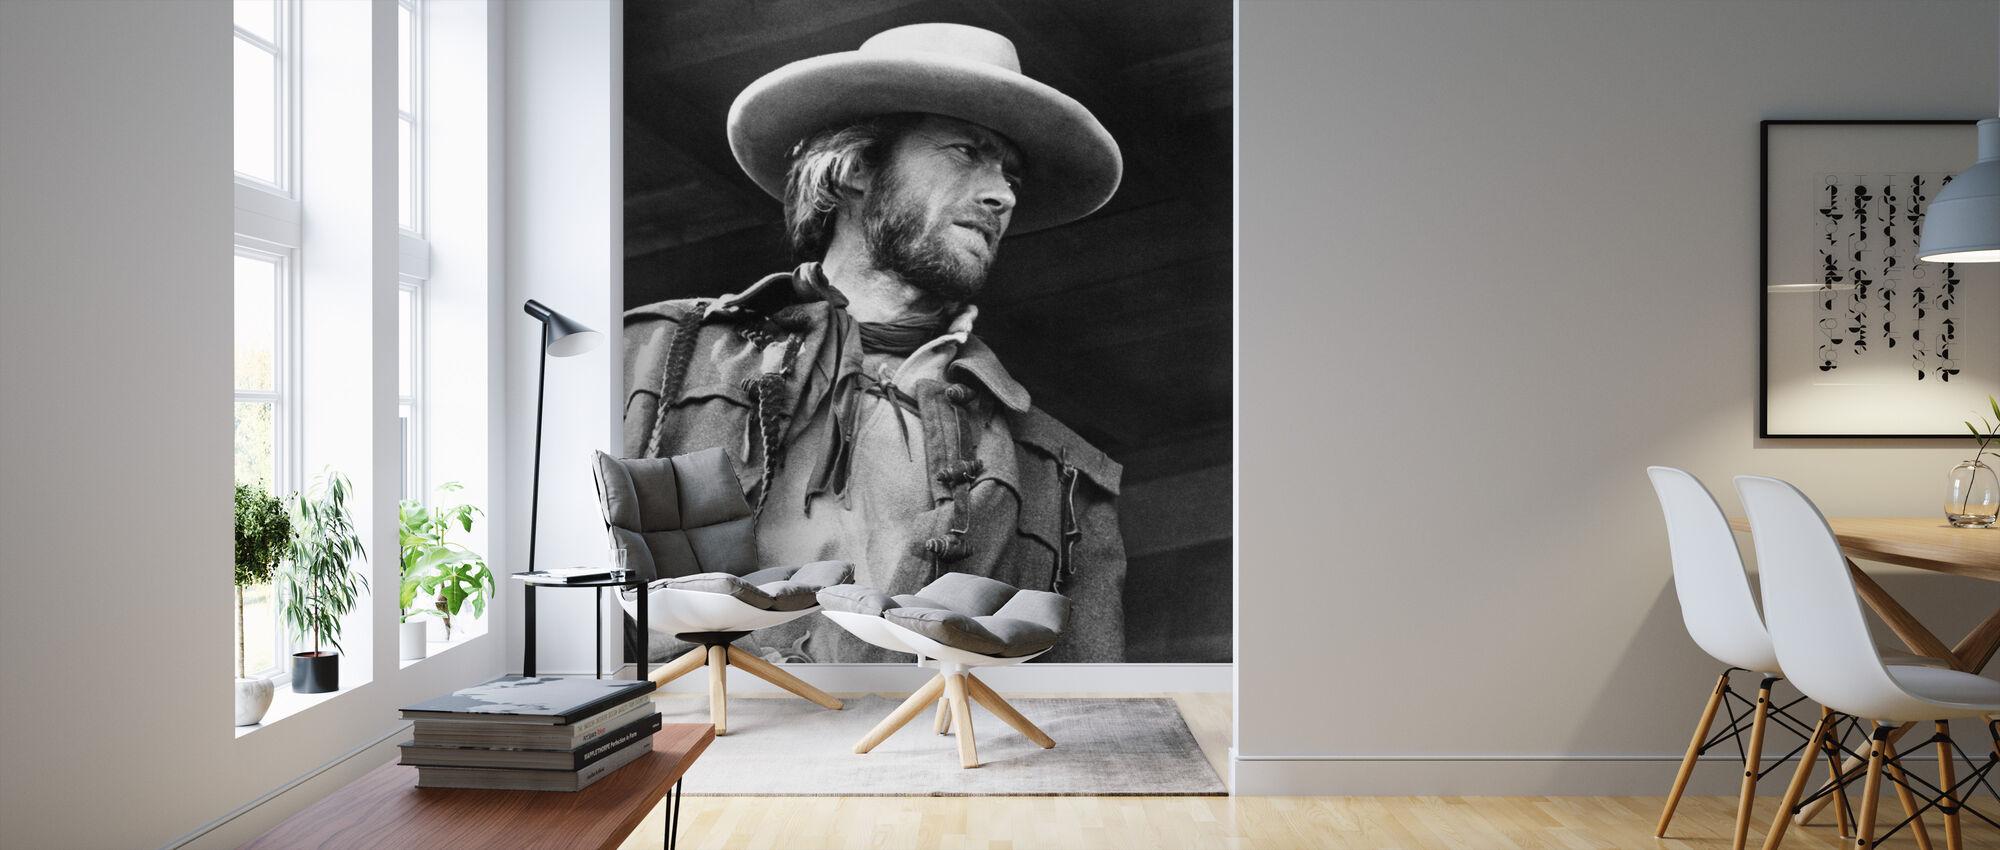 Outlaw Josey Wales - Harmaa asteikko - Tapetti - Olohuone